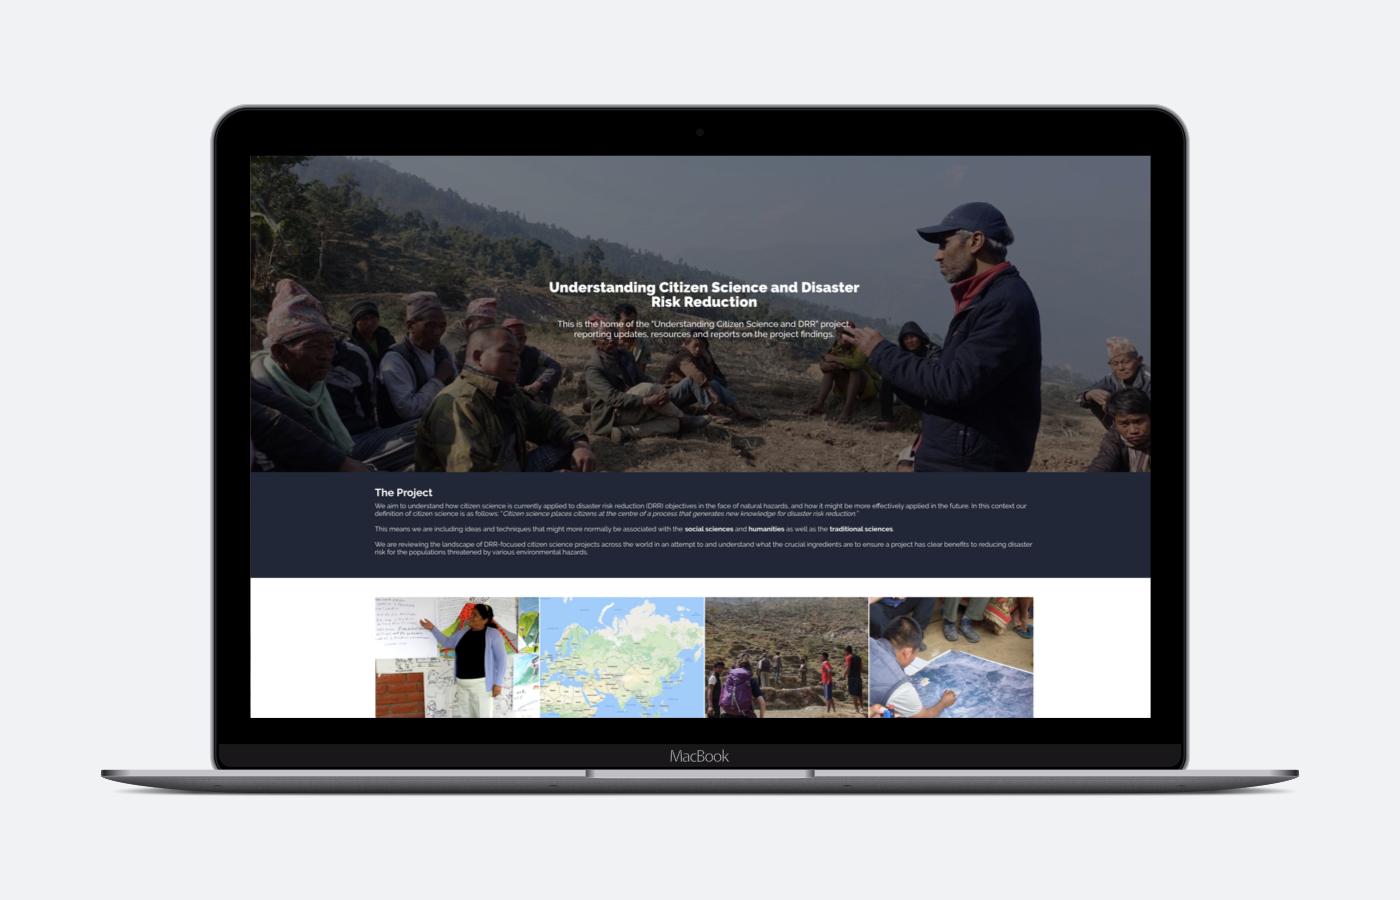 CSDRR website launches